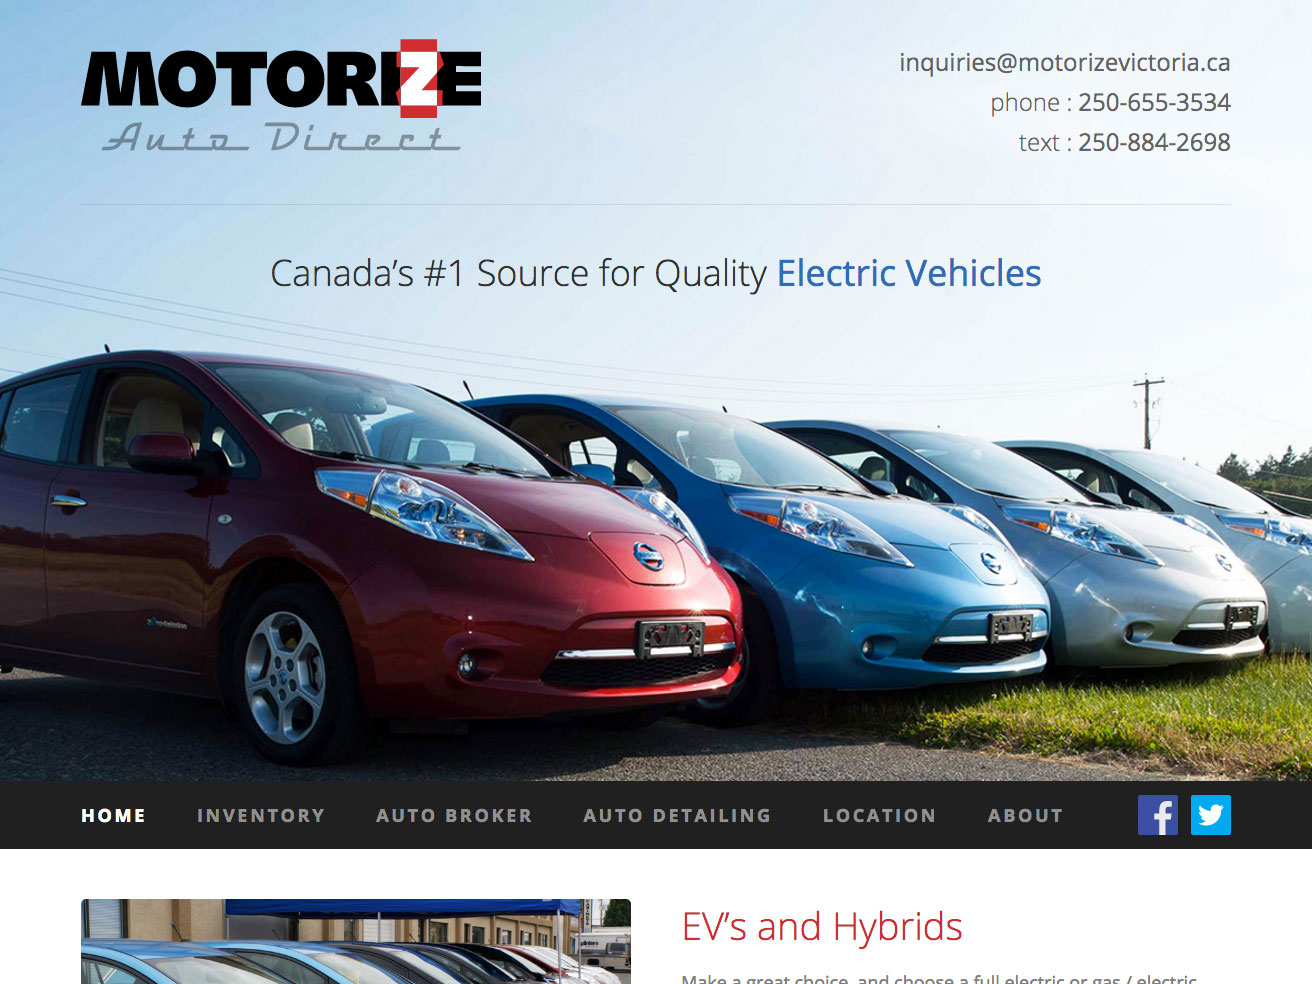 Motorize Auto Direct